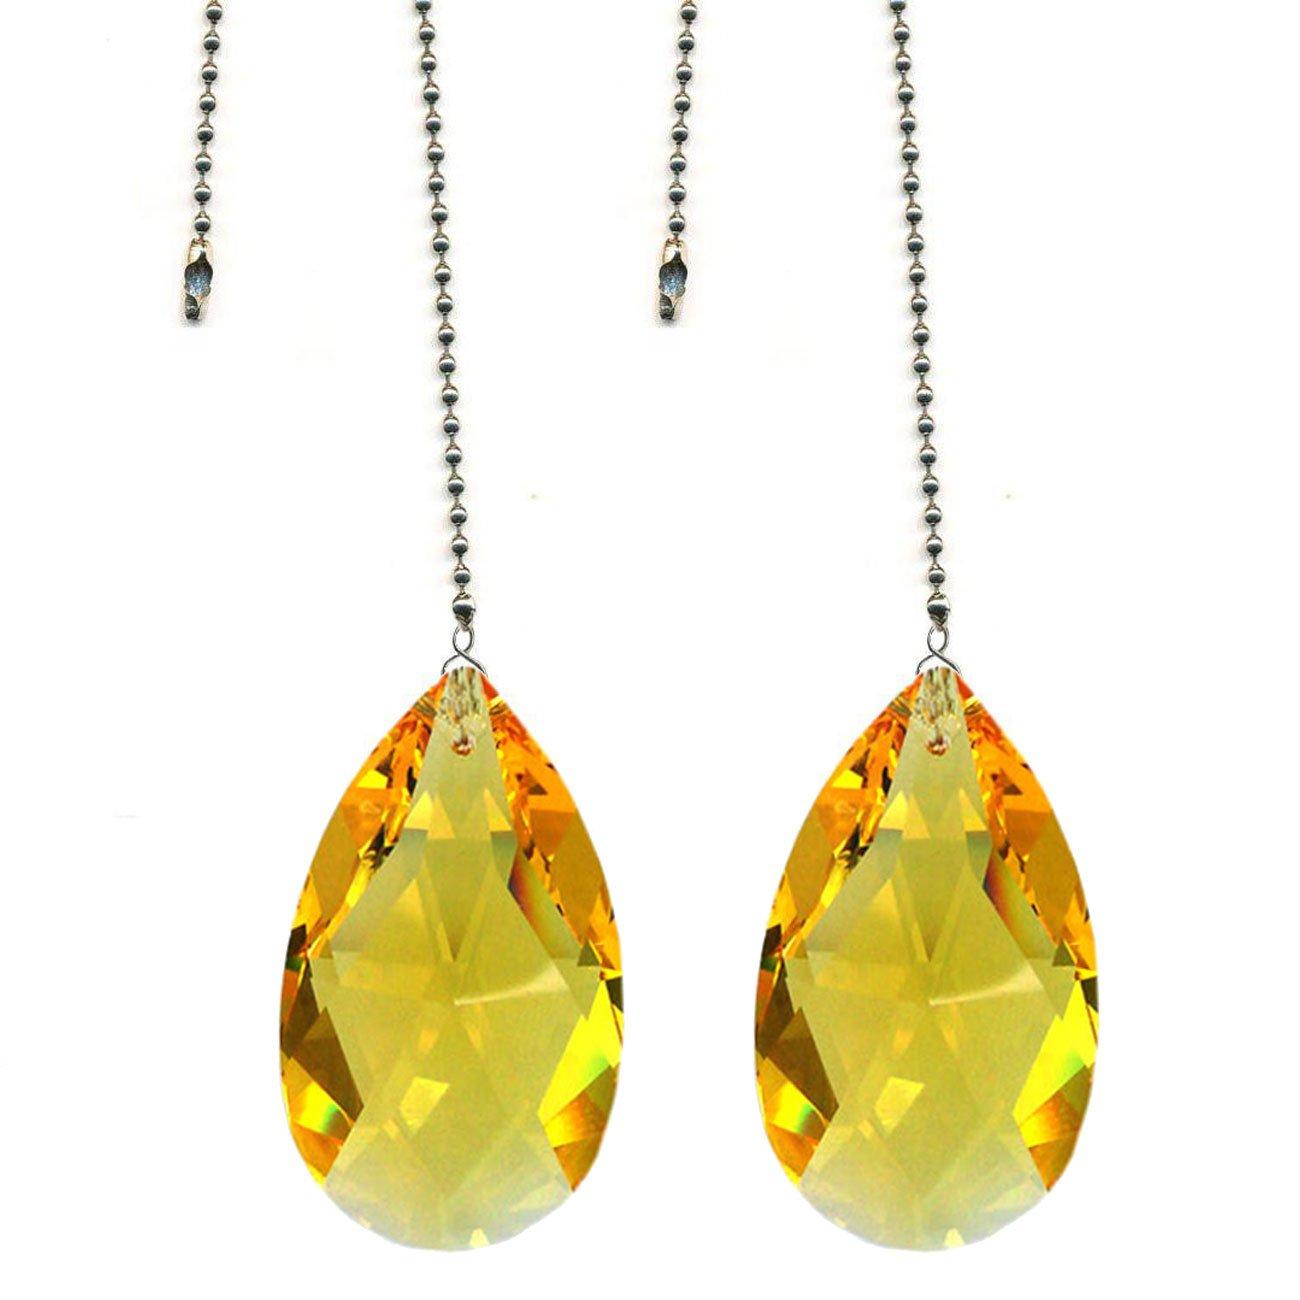 CrystalPlace Ceiling Fan Pull Chain Swarovski Strass Light Topaz Crystal Almond Prism Fan Pulley Set of 2